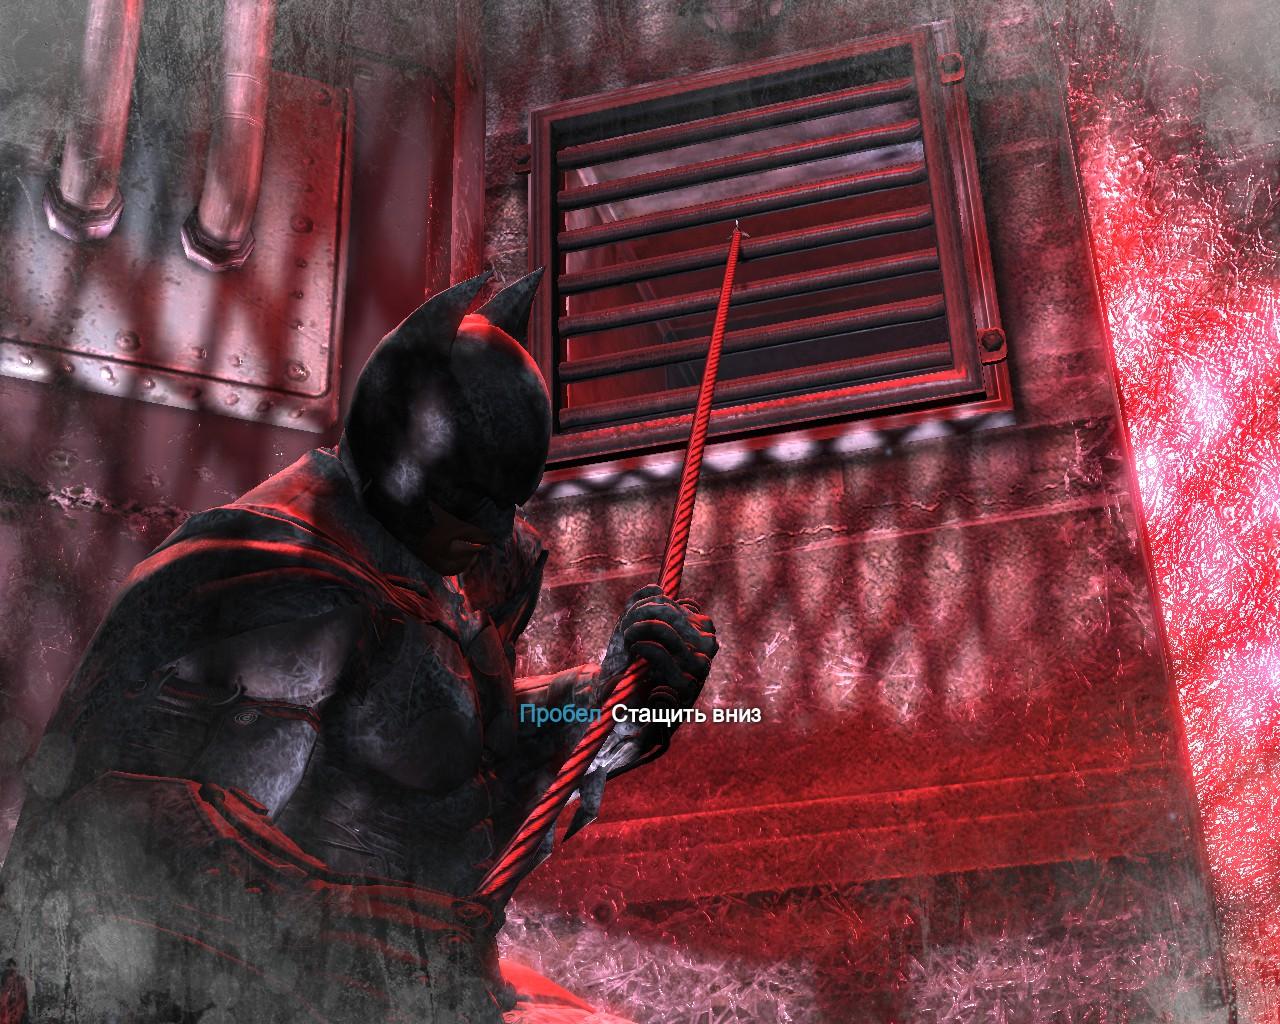 BatmanOrigins 2014-07-13 01-06-51-01.jpg - Batman: Arkham Origins